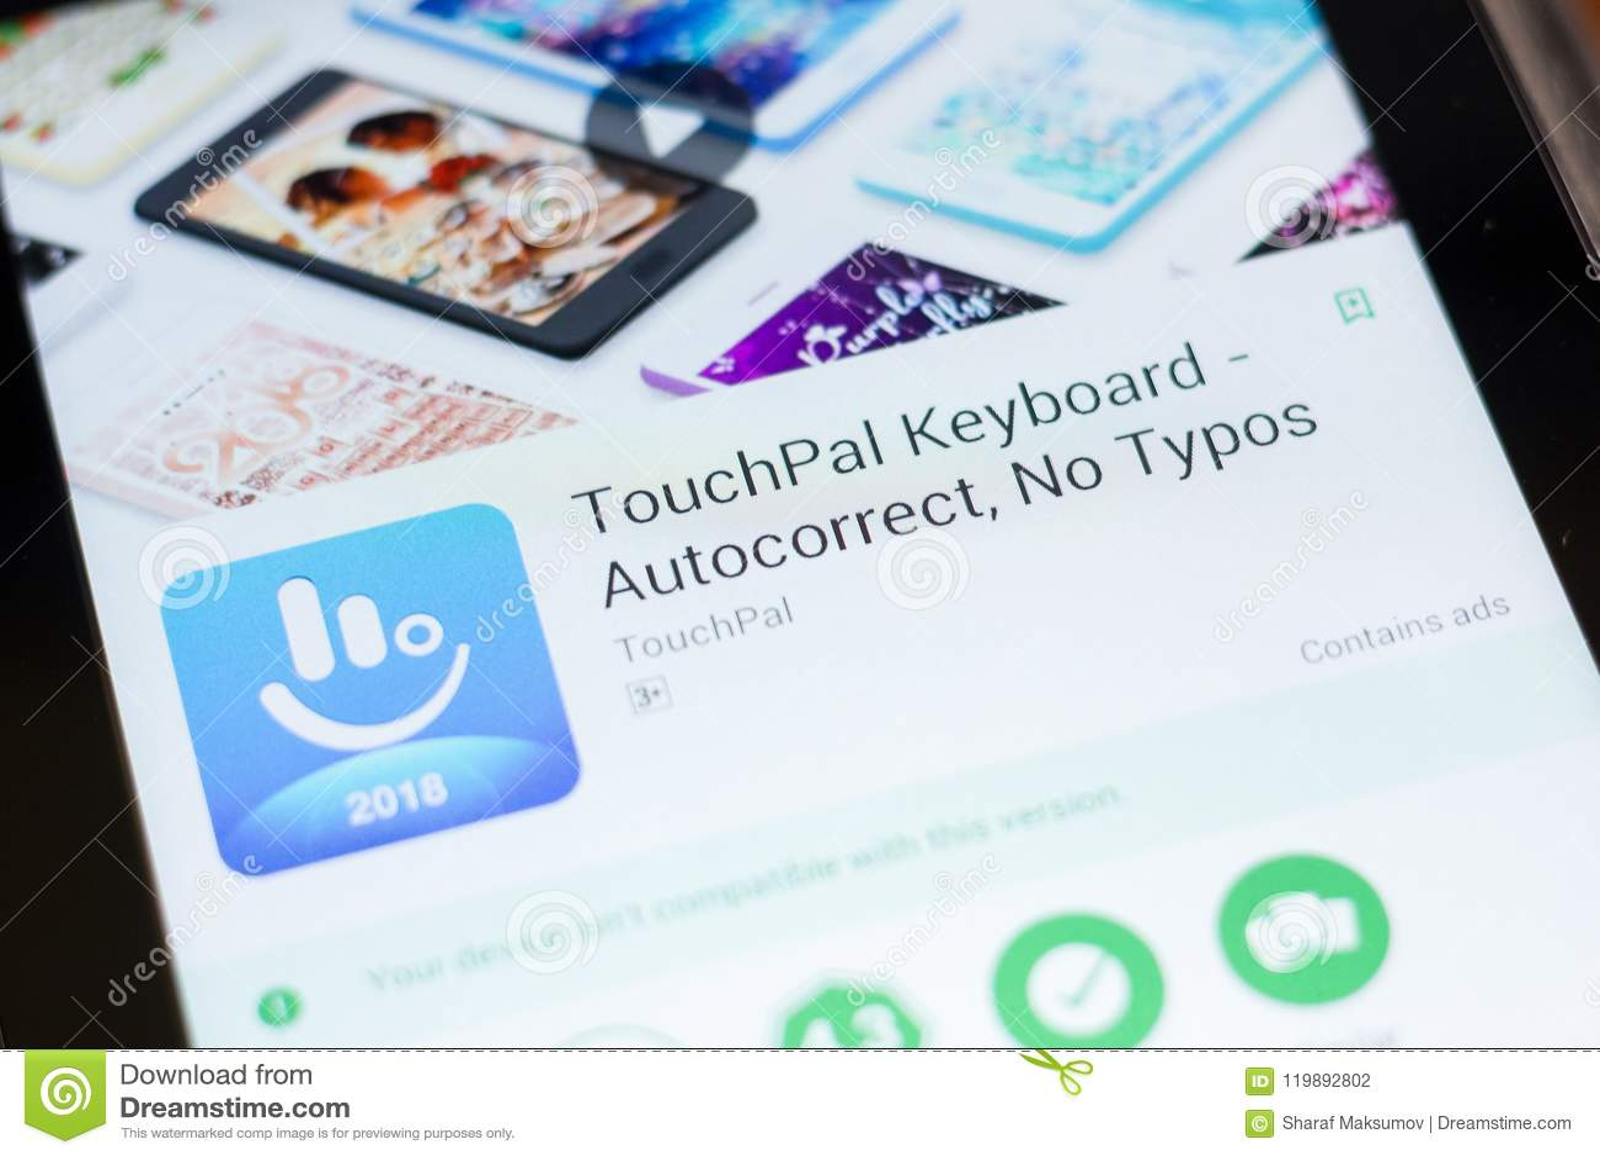 Touchpal 2019 Apk